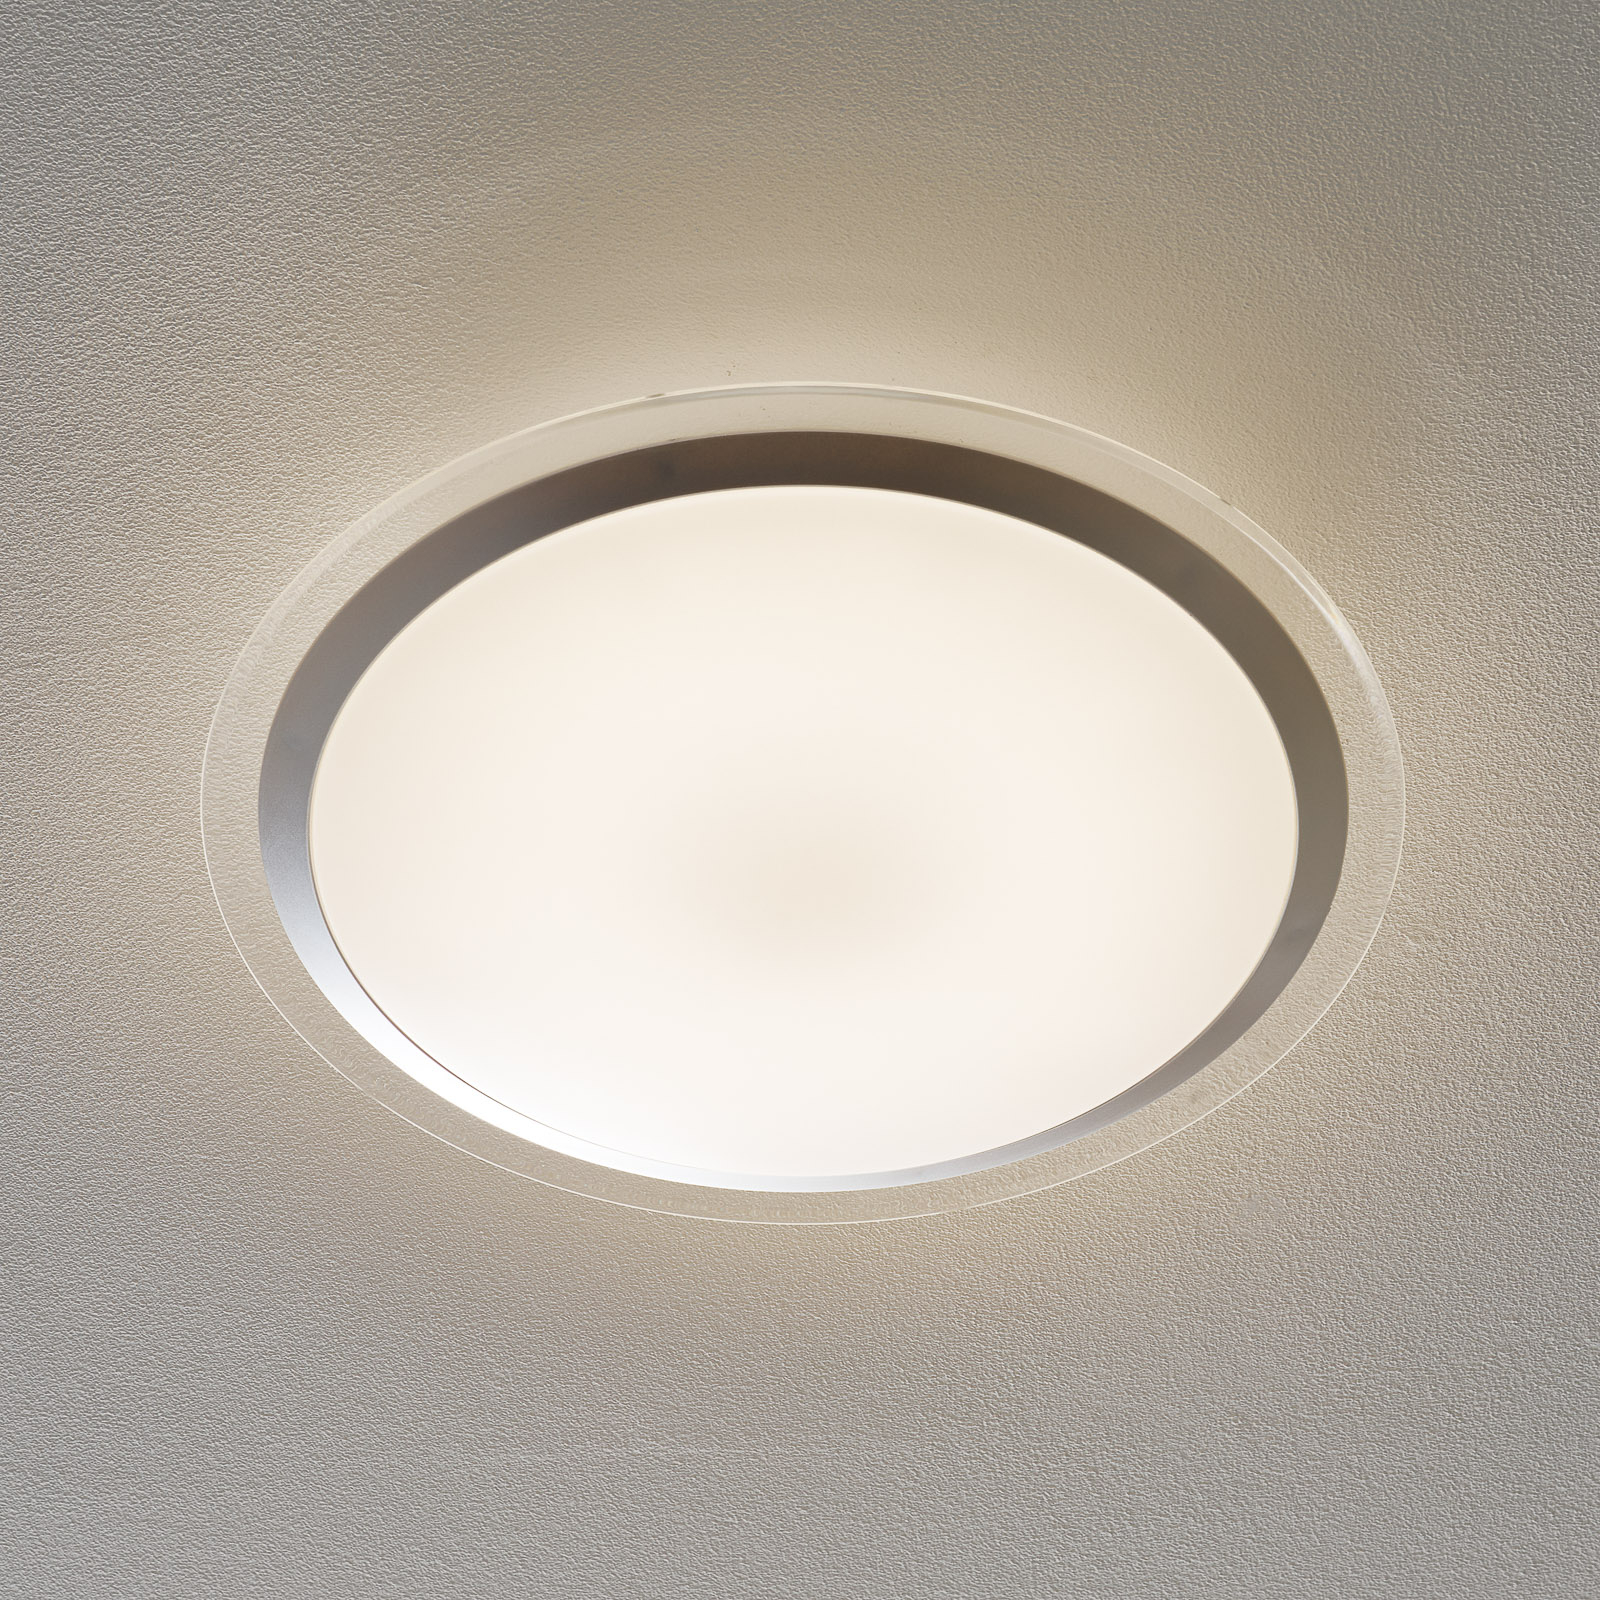 EGLO connect Competa-C LED-taklampa